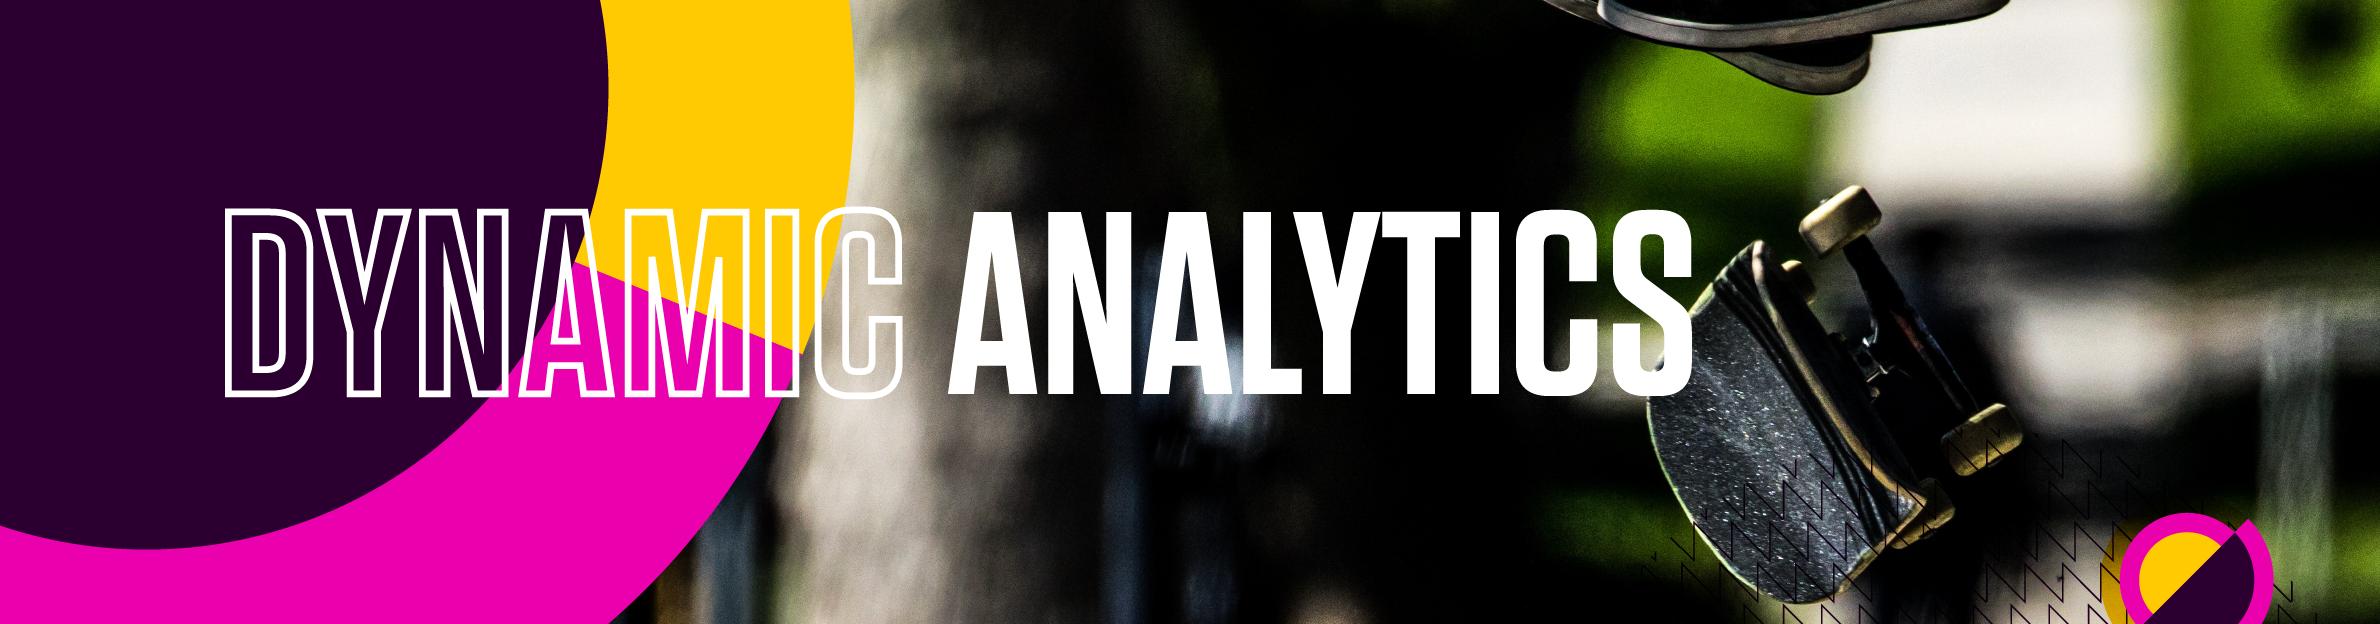 banner_dynamic_analytics-internal@2x.png